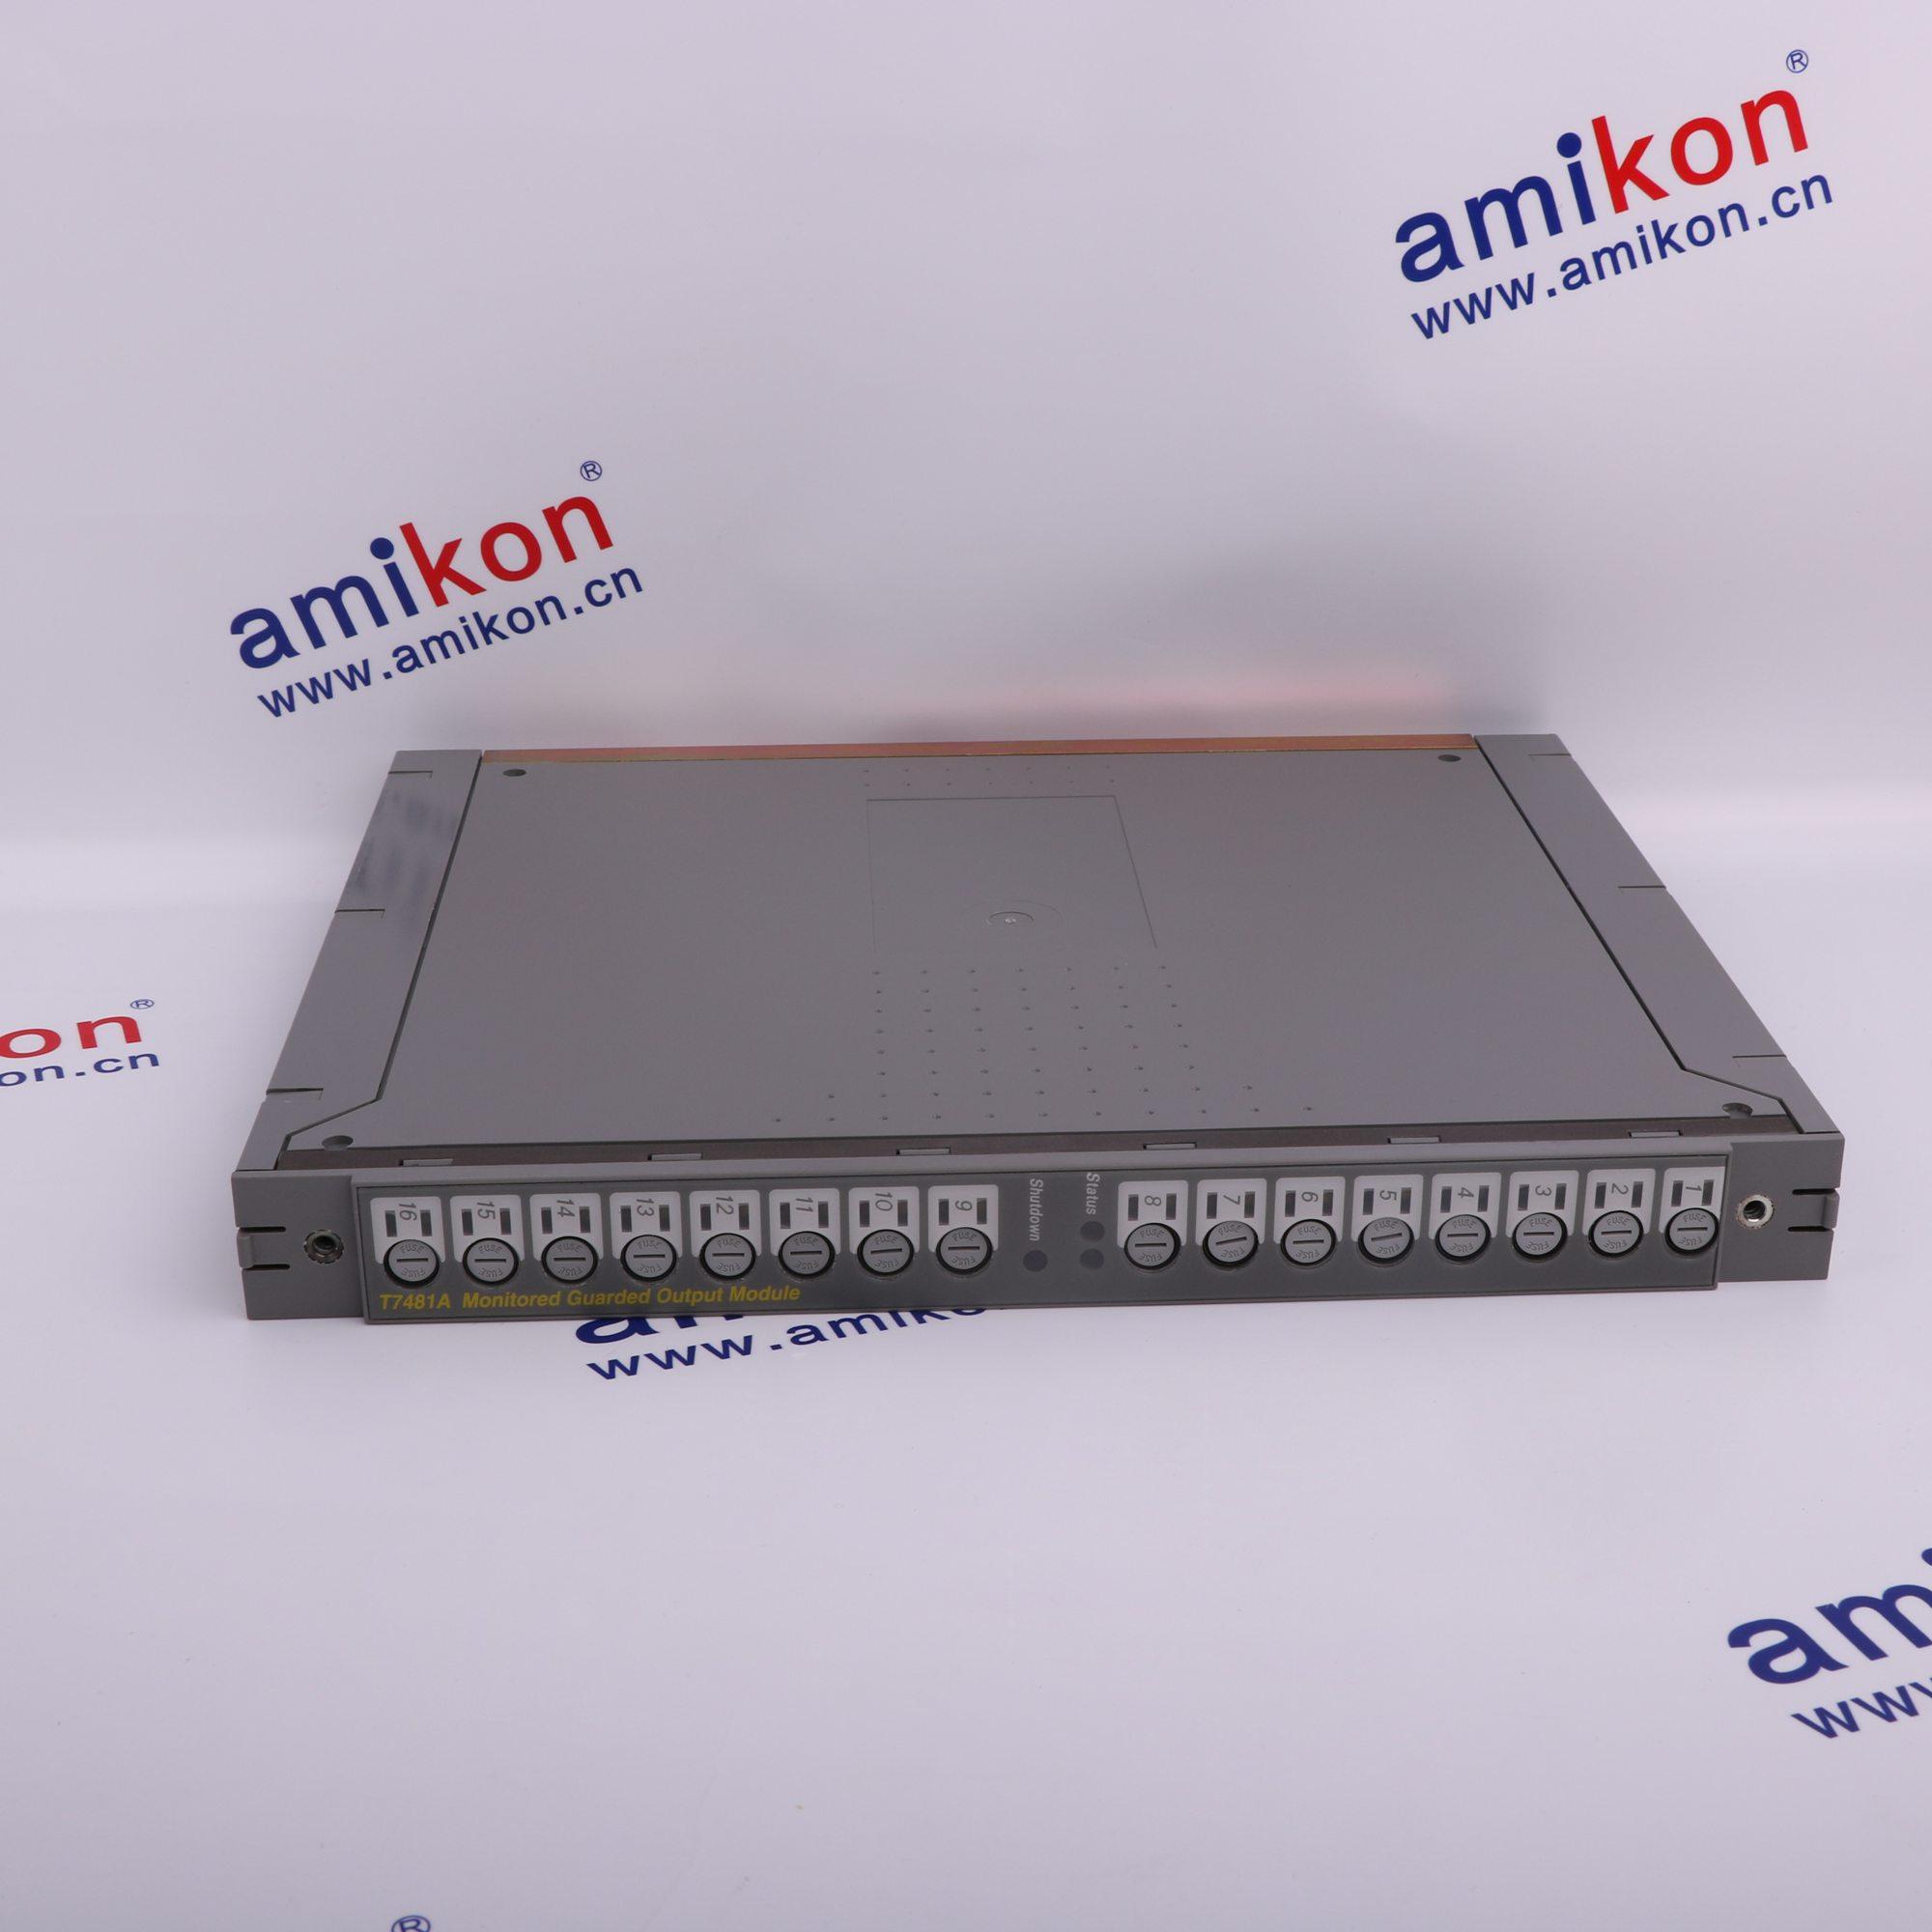 T8123 Trusted TMR Processor Interface Adaptor